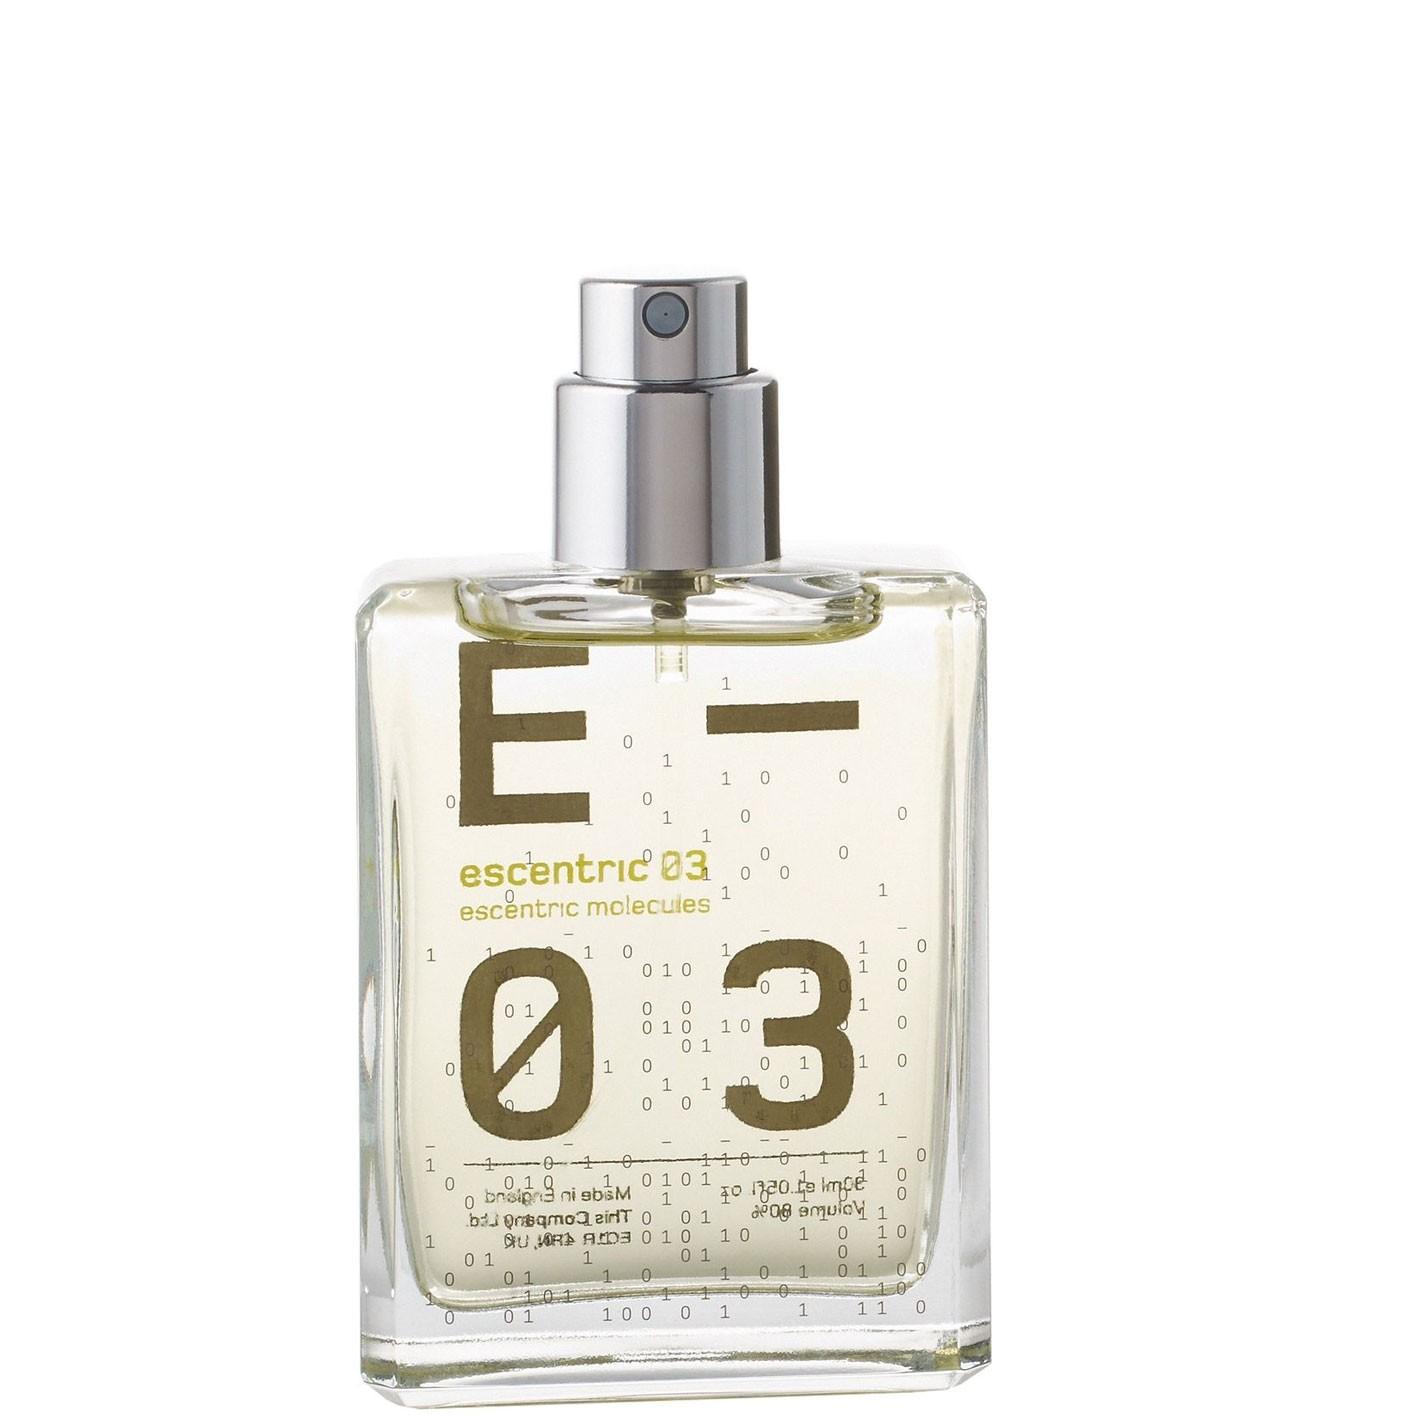 Afbeelding van Escentric Molecules 03 30 ml spray refill